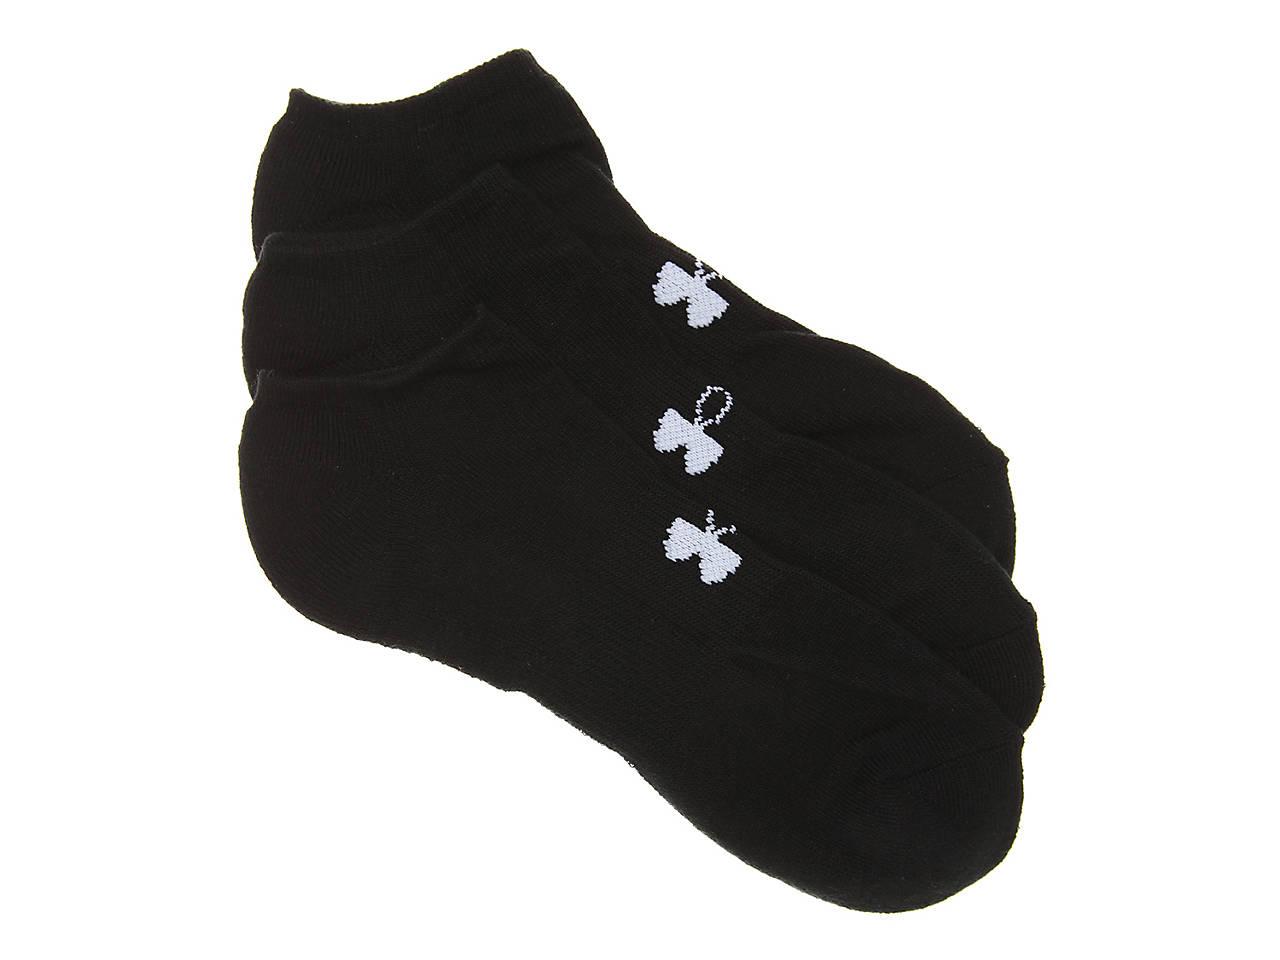 5a4b758957bb Under Armour HeatGear Mens No Show Socks - 3 Pack Men's Handbags ...